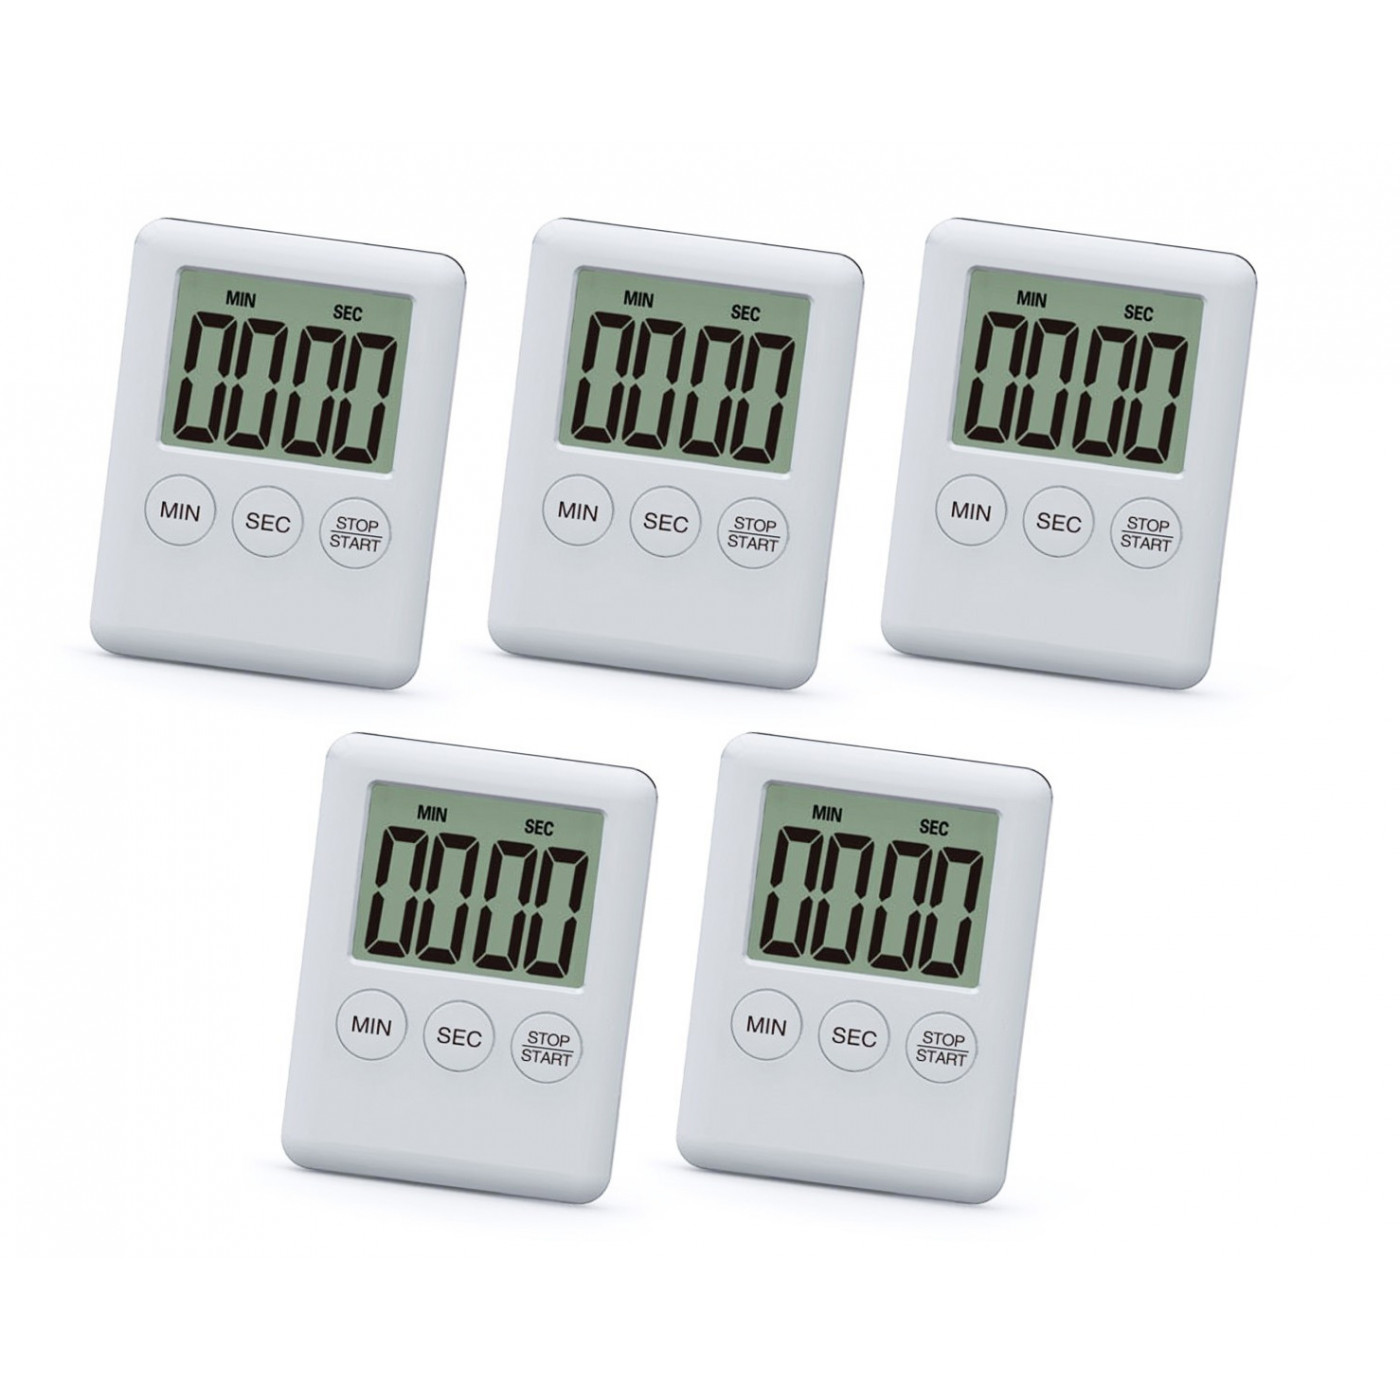 Set of 5 digital timers, alarm clocks, white